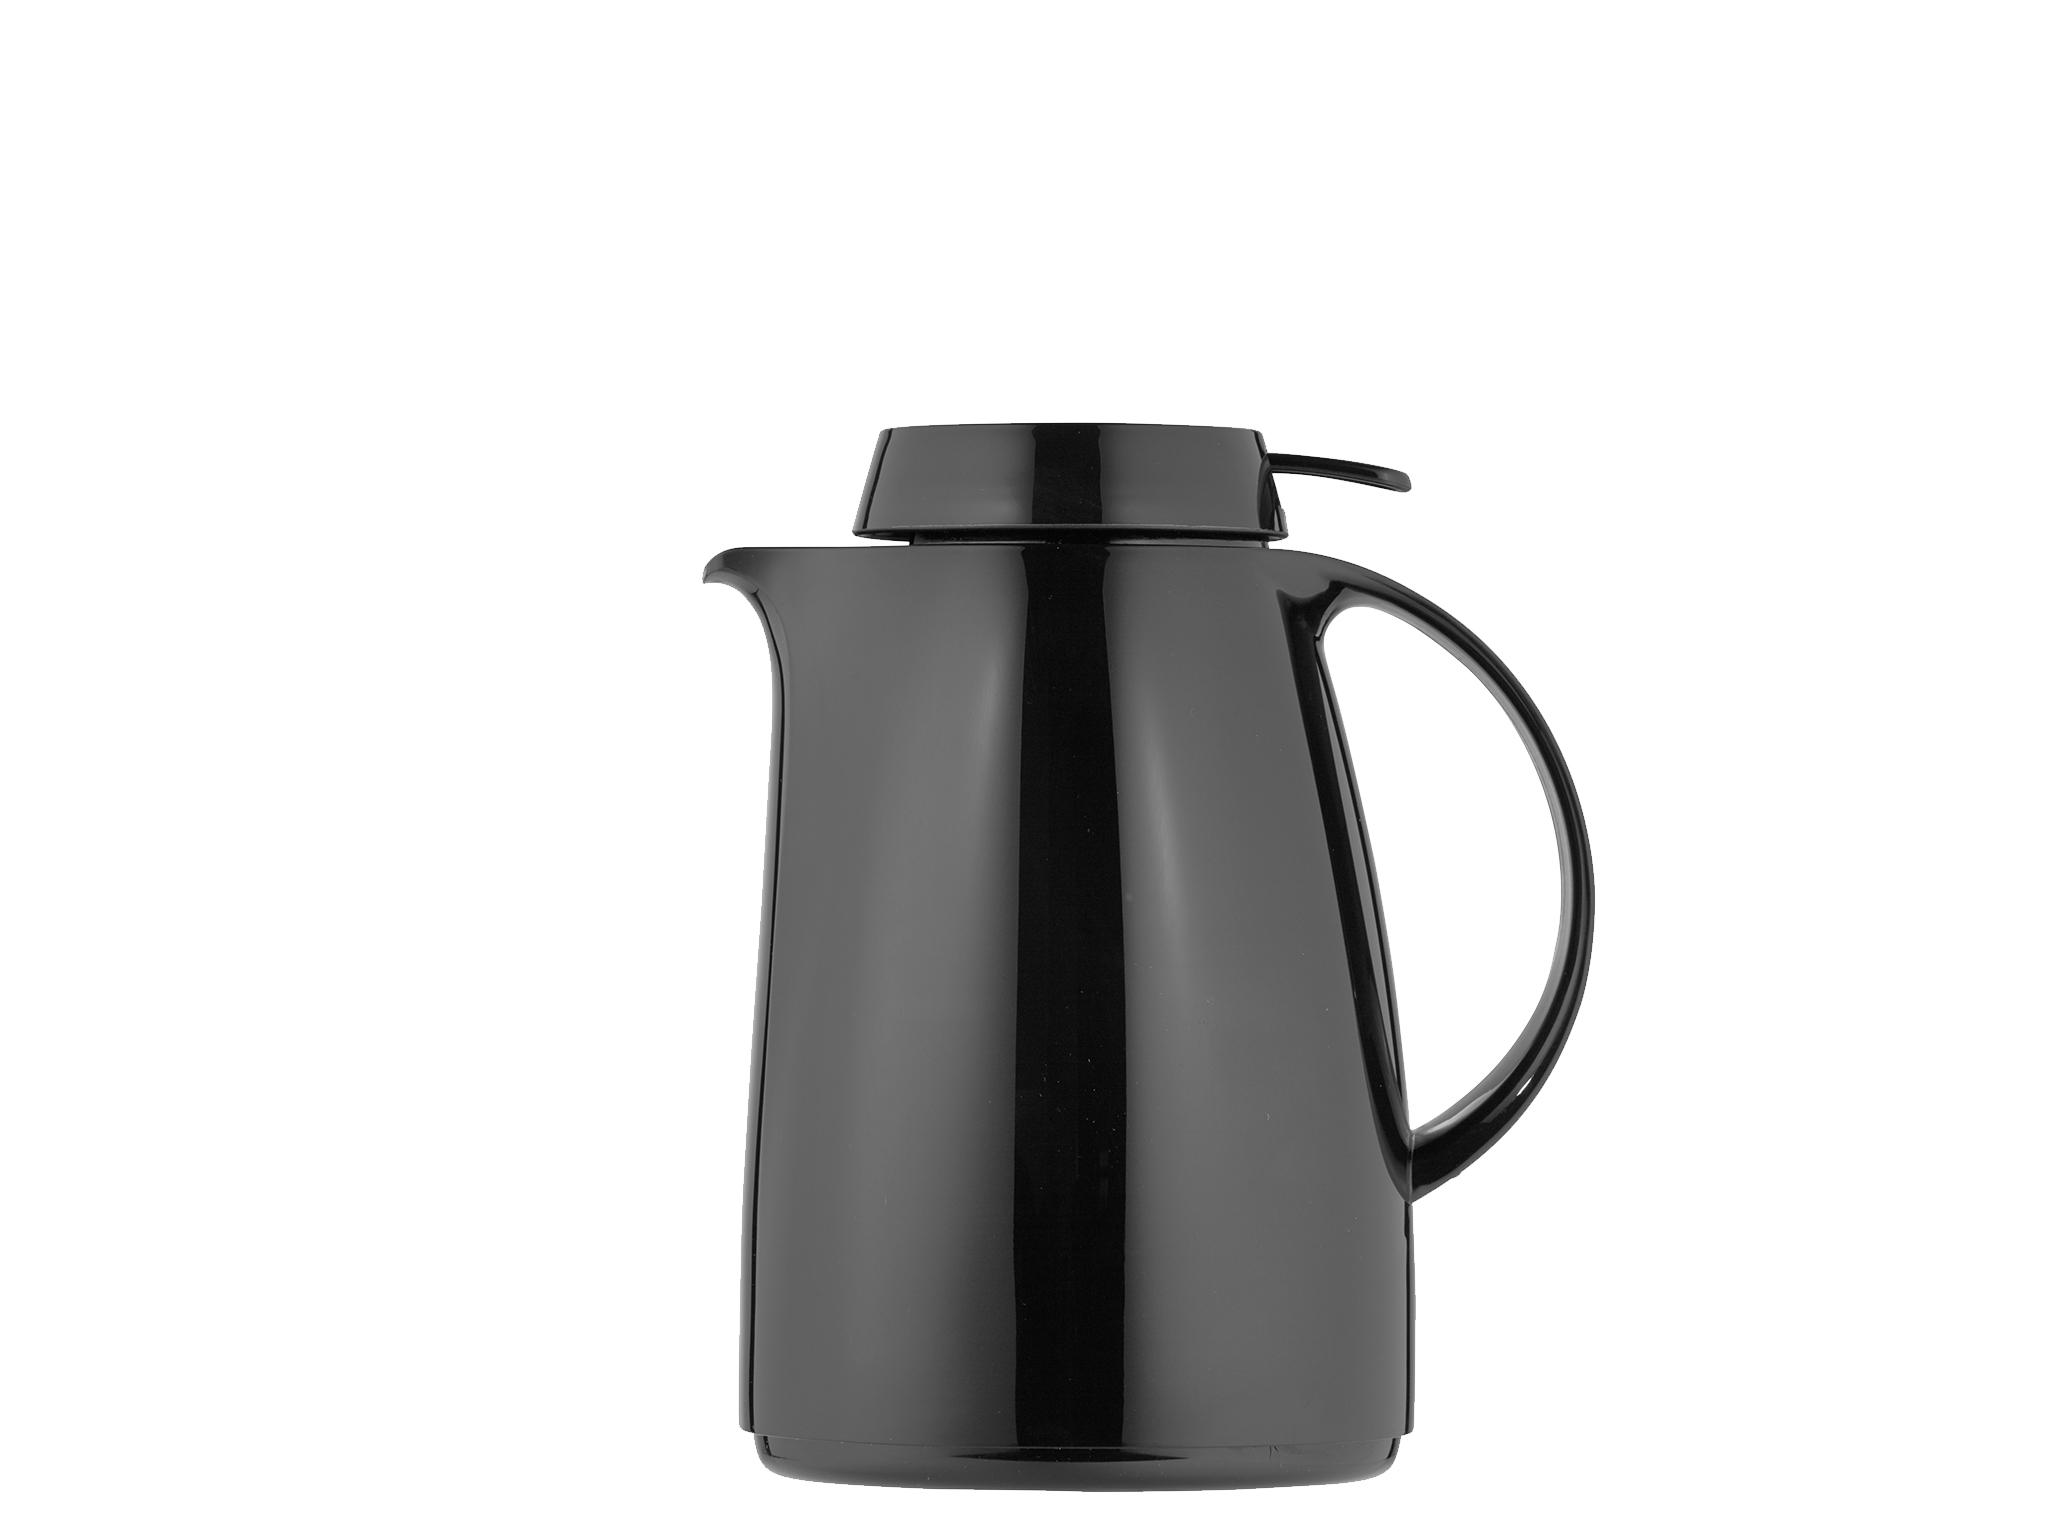 7204-002 - Vacuum carafe black 1.0 L SERVITHERM - Helios